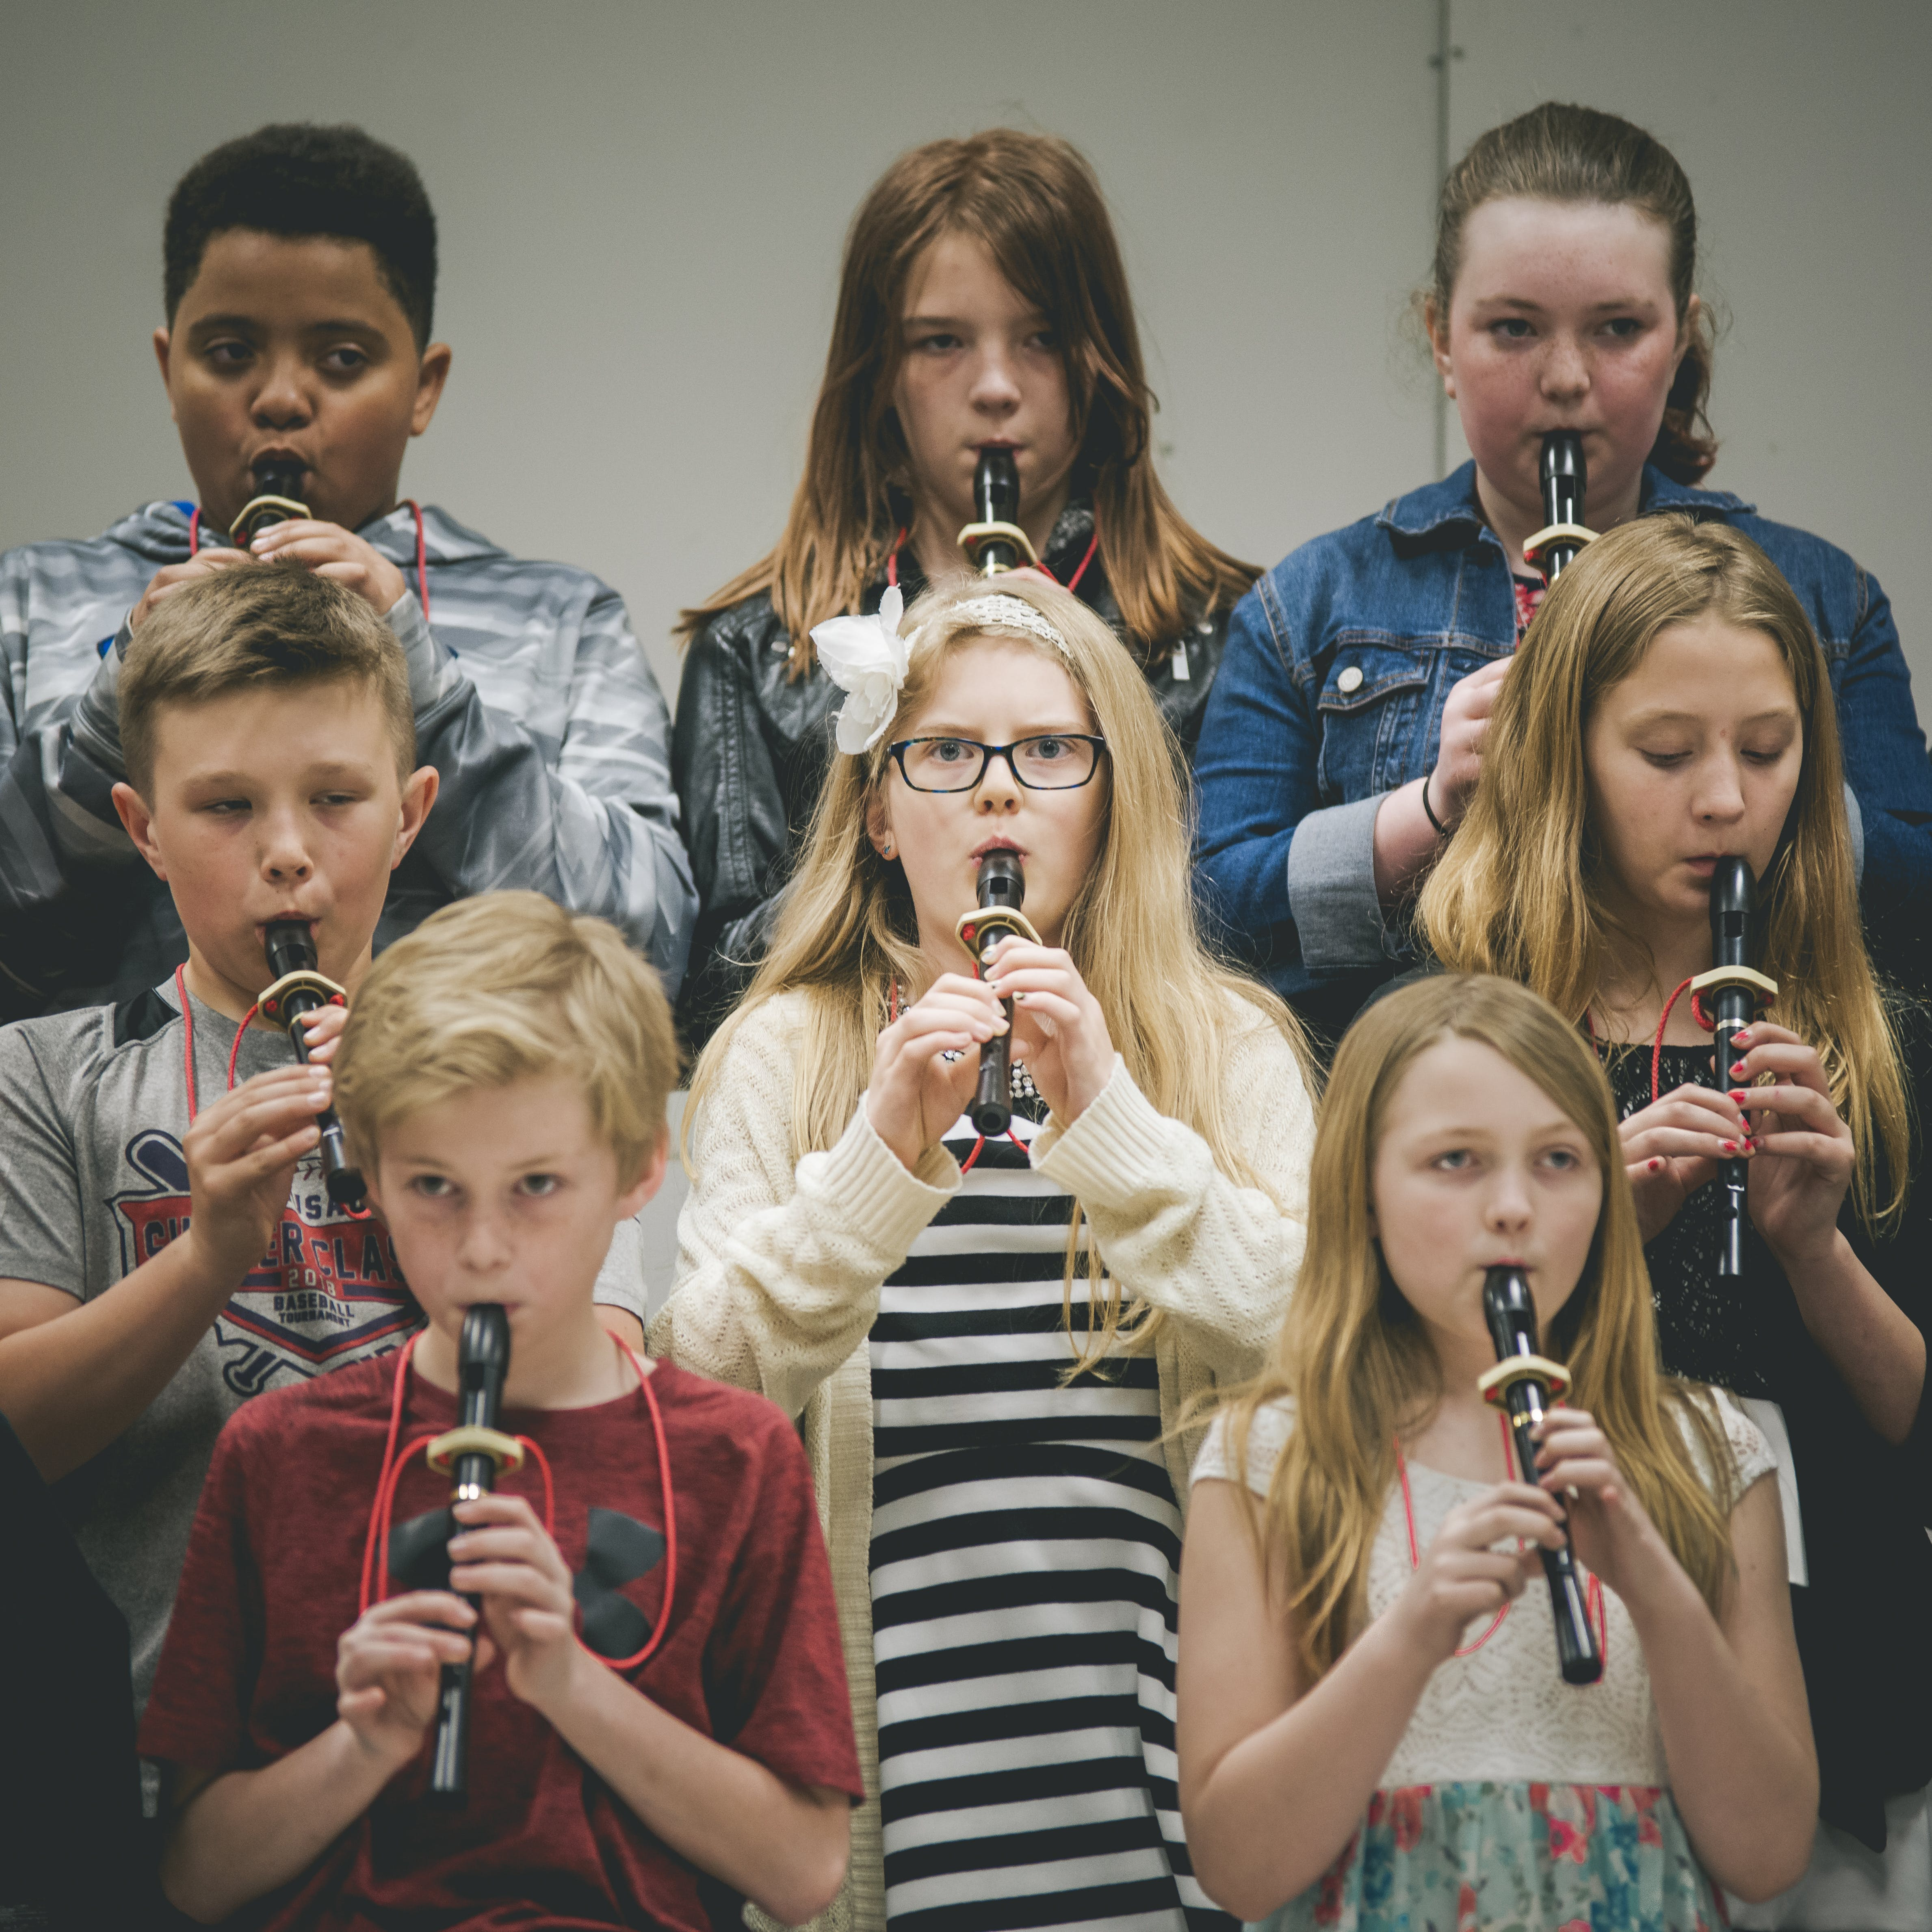 Kostenloses Stock Foto zu fokus, grundschule, kinder, musik